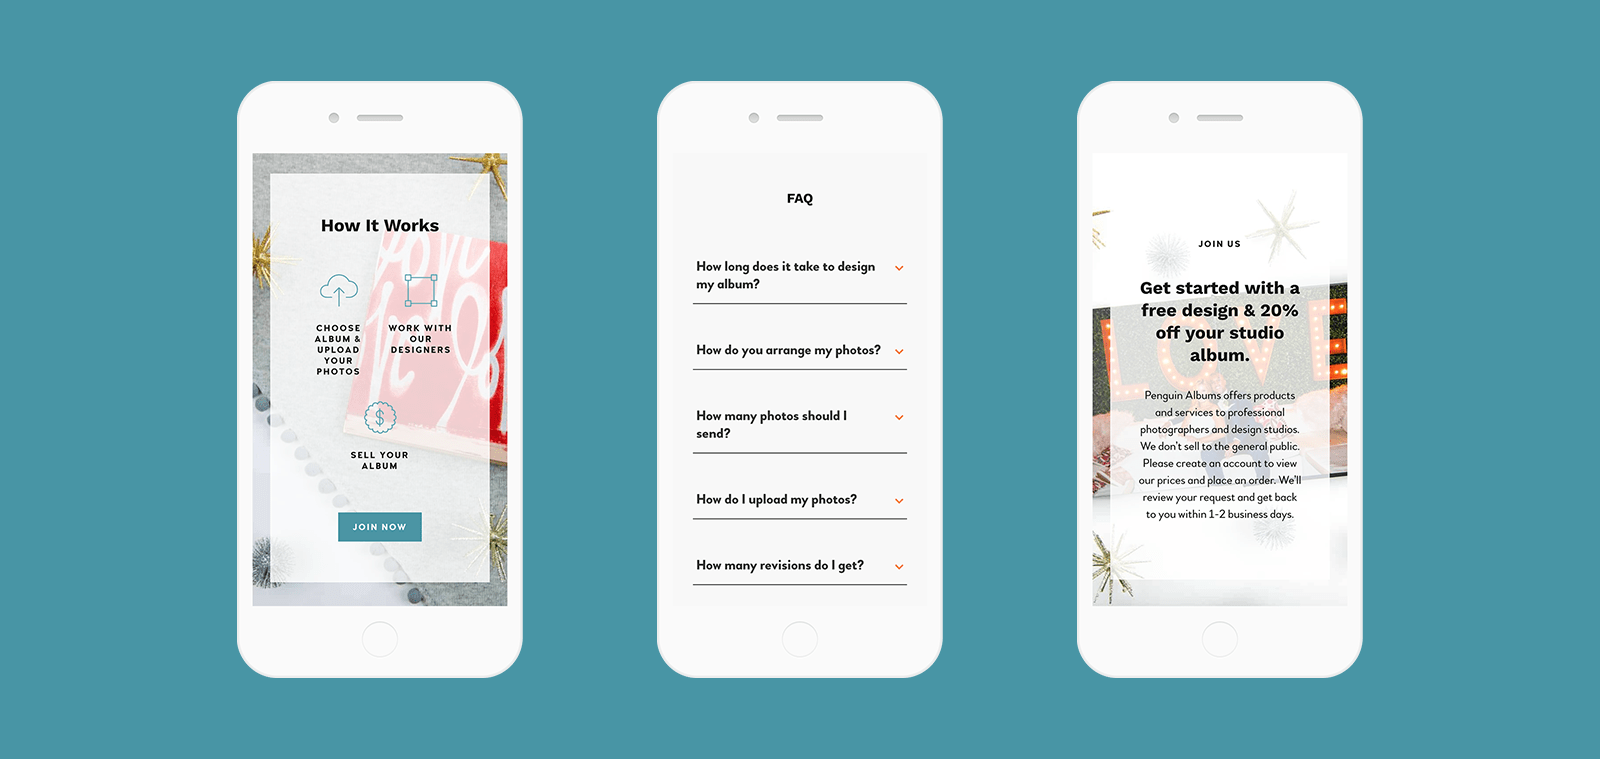 mobile screenshots of website design